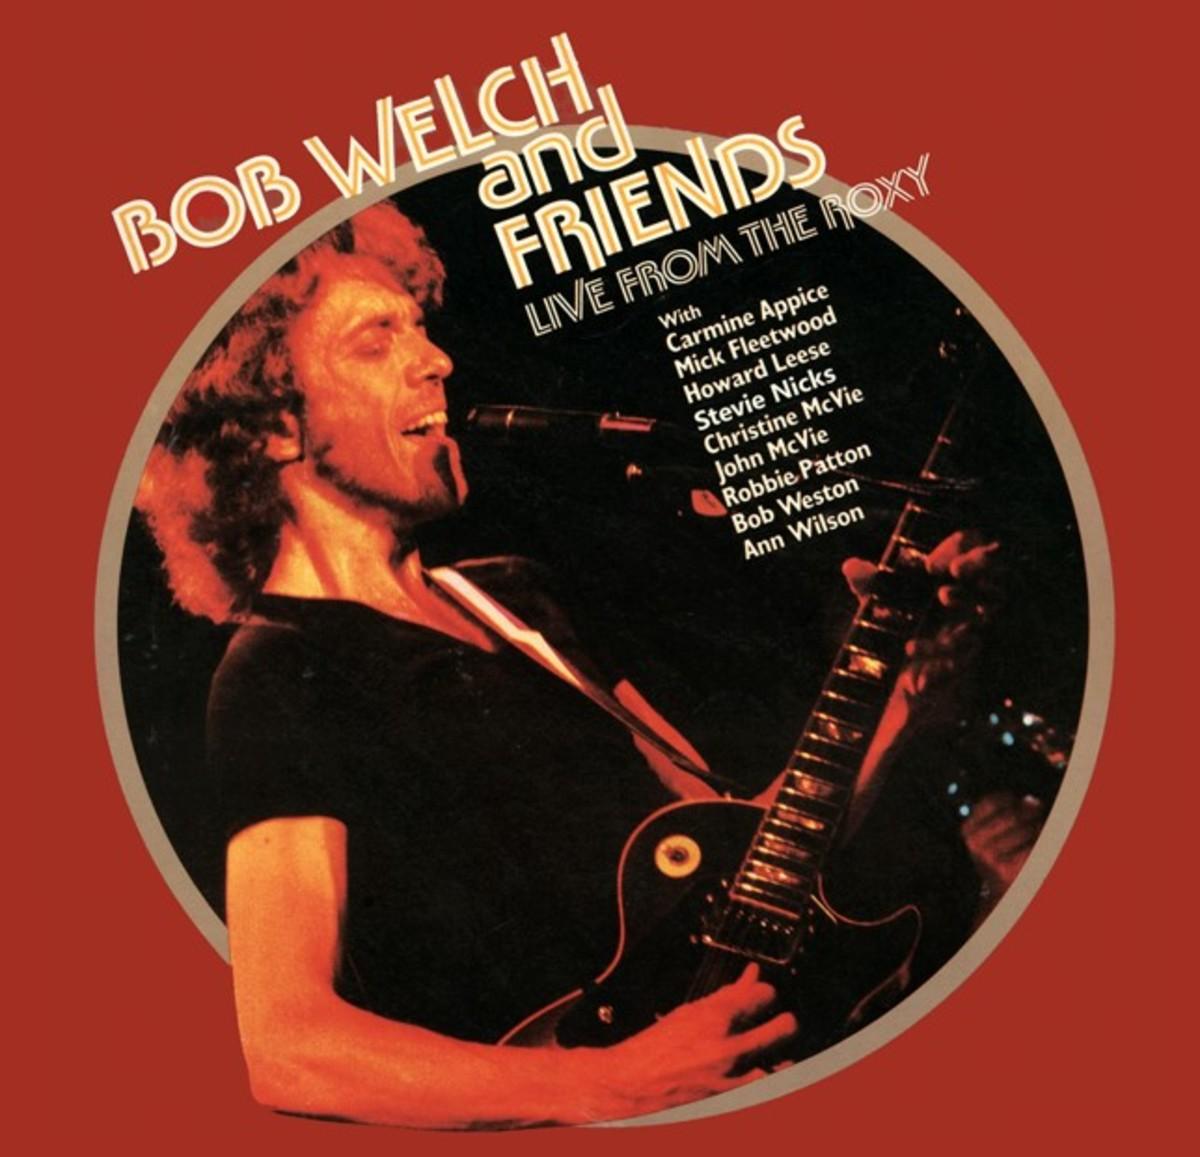 Magnum Bob Welch